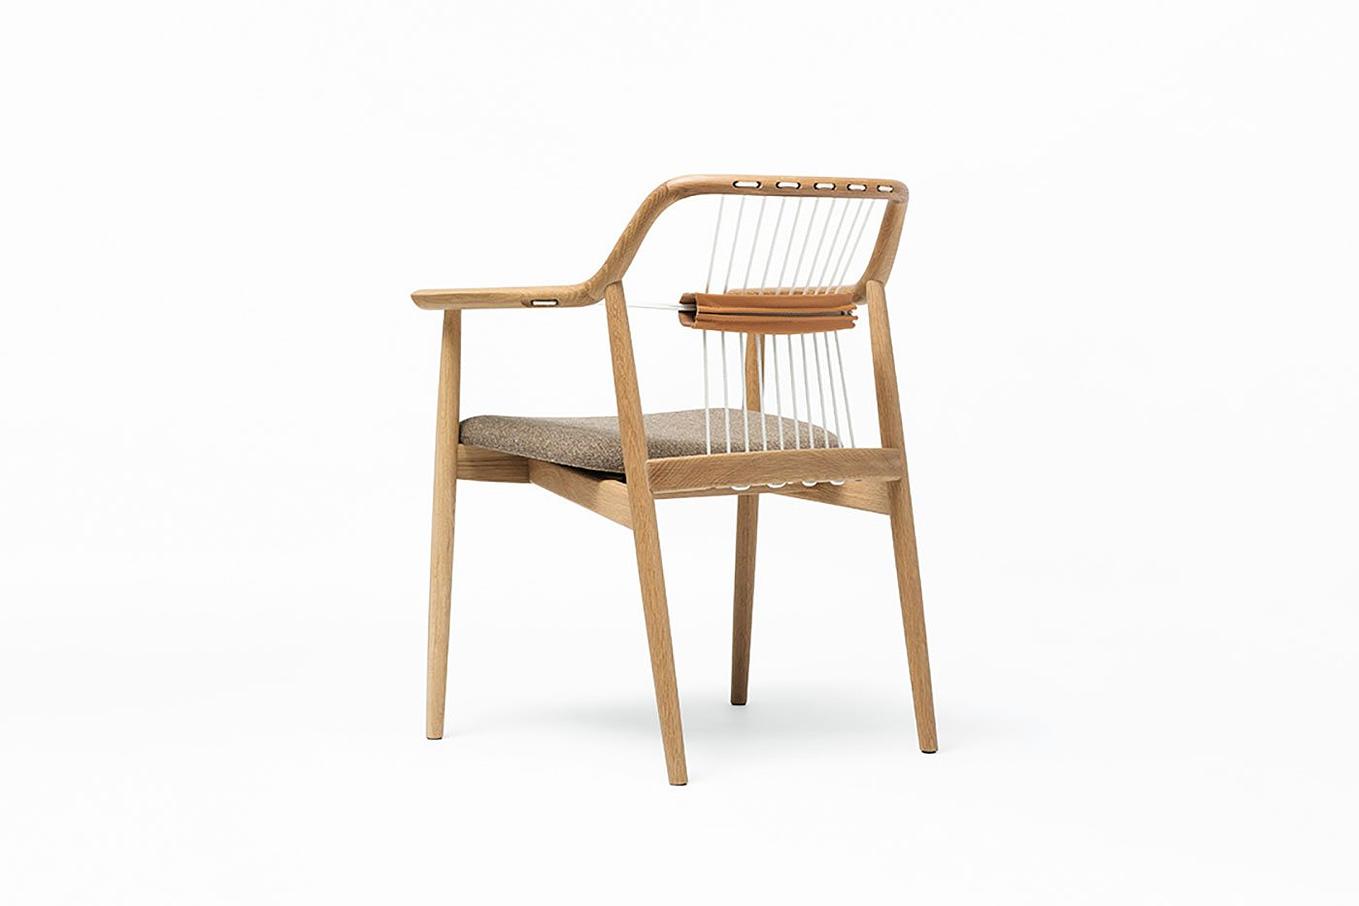 yc1-chair-by-mikiya-kobayashi-8